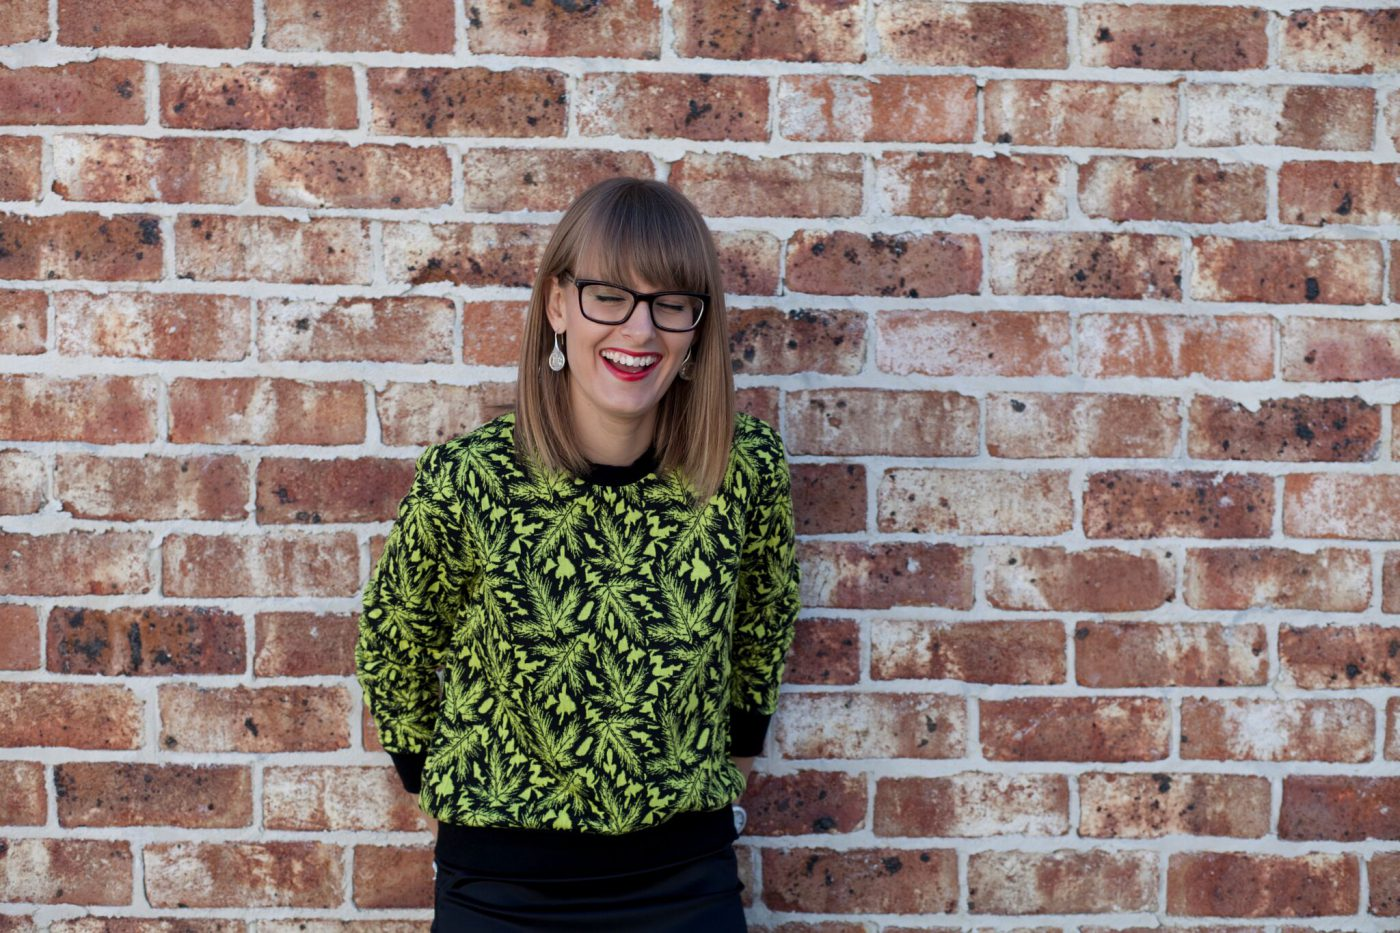 Photoshoot Entrpreneur Lis Dingjan Identity Division Brisbane Perth London Nederland Netherlands Marisa Kate Designs